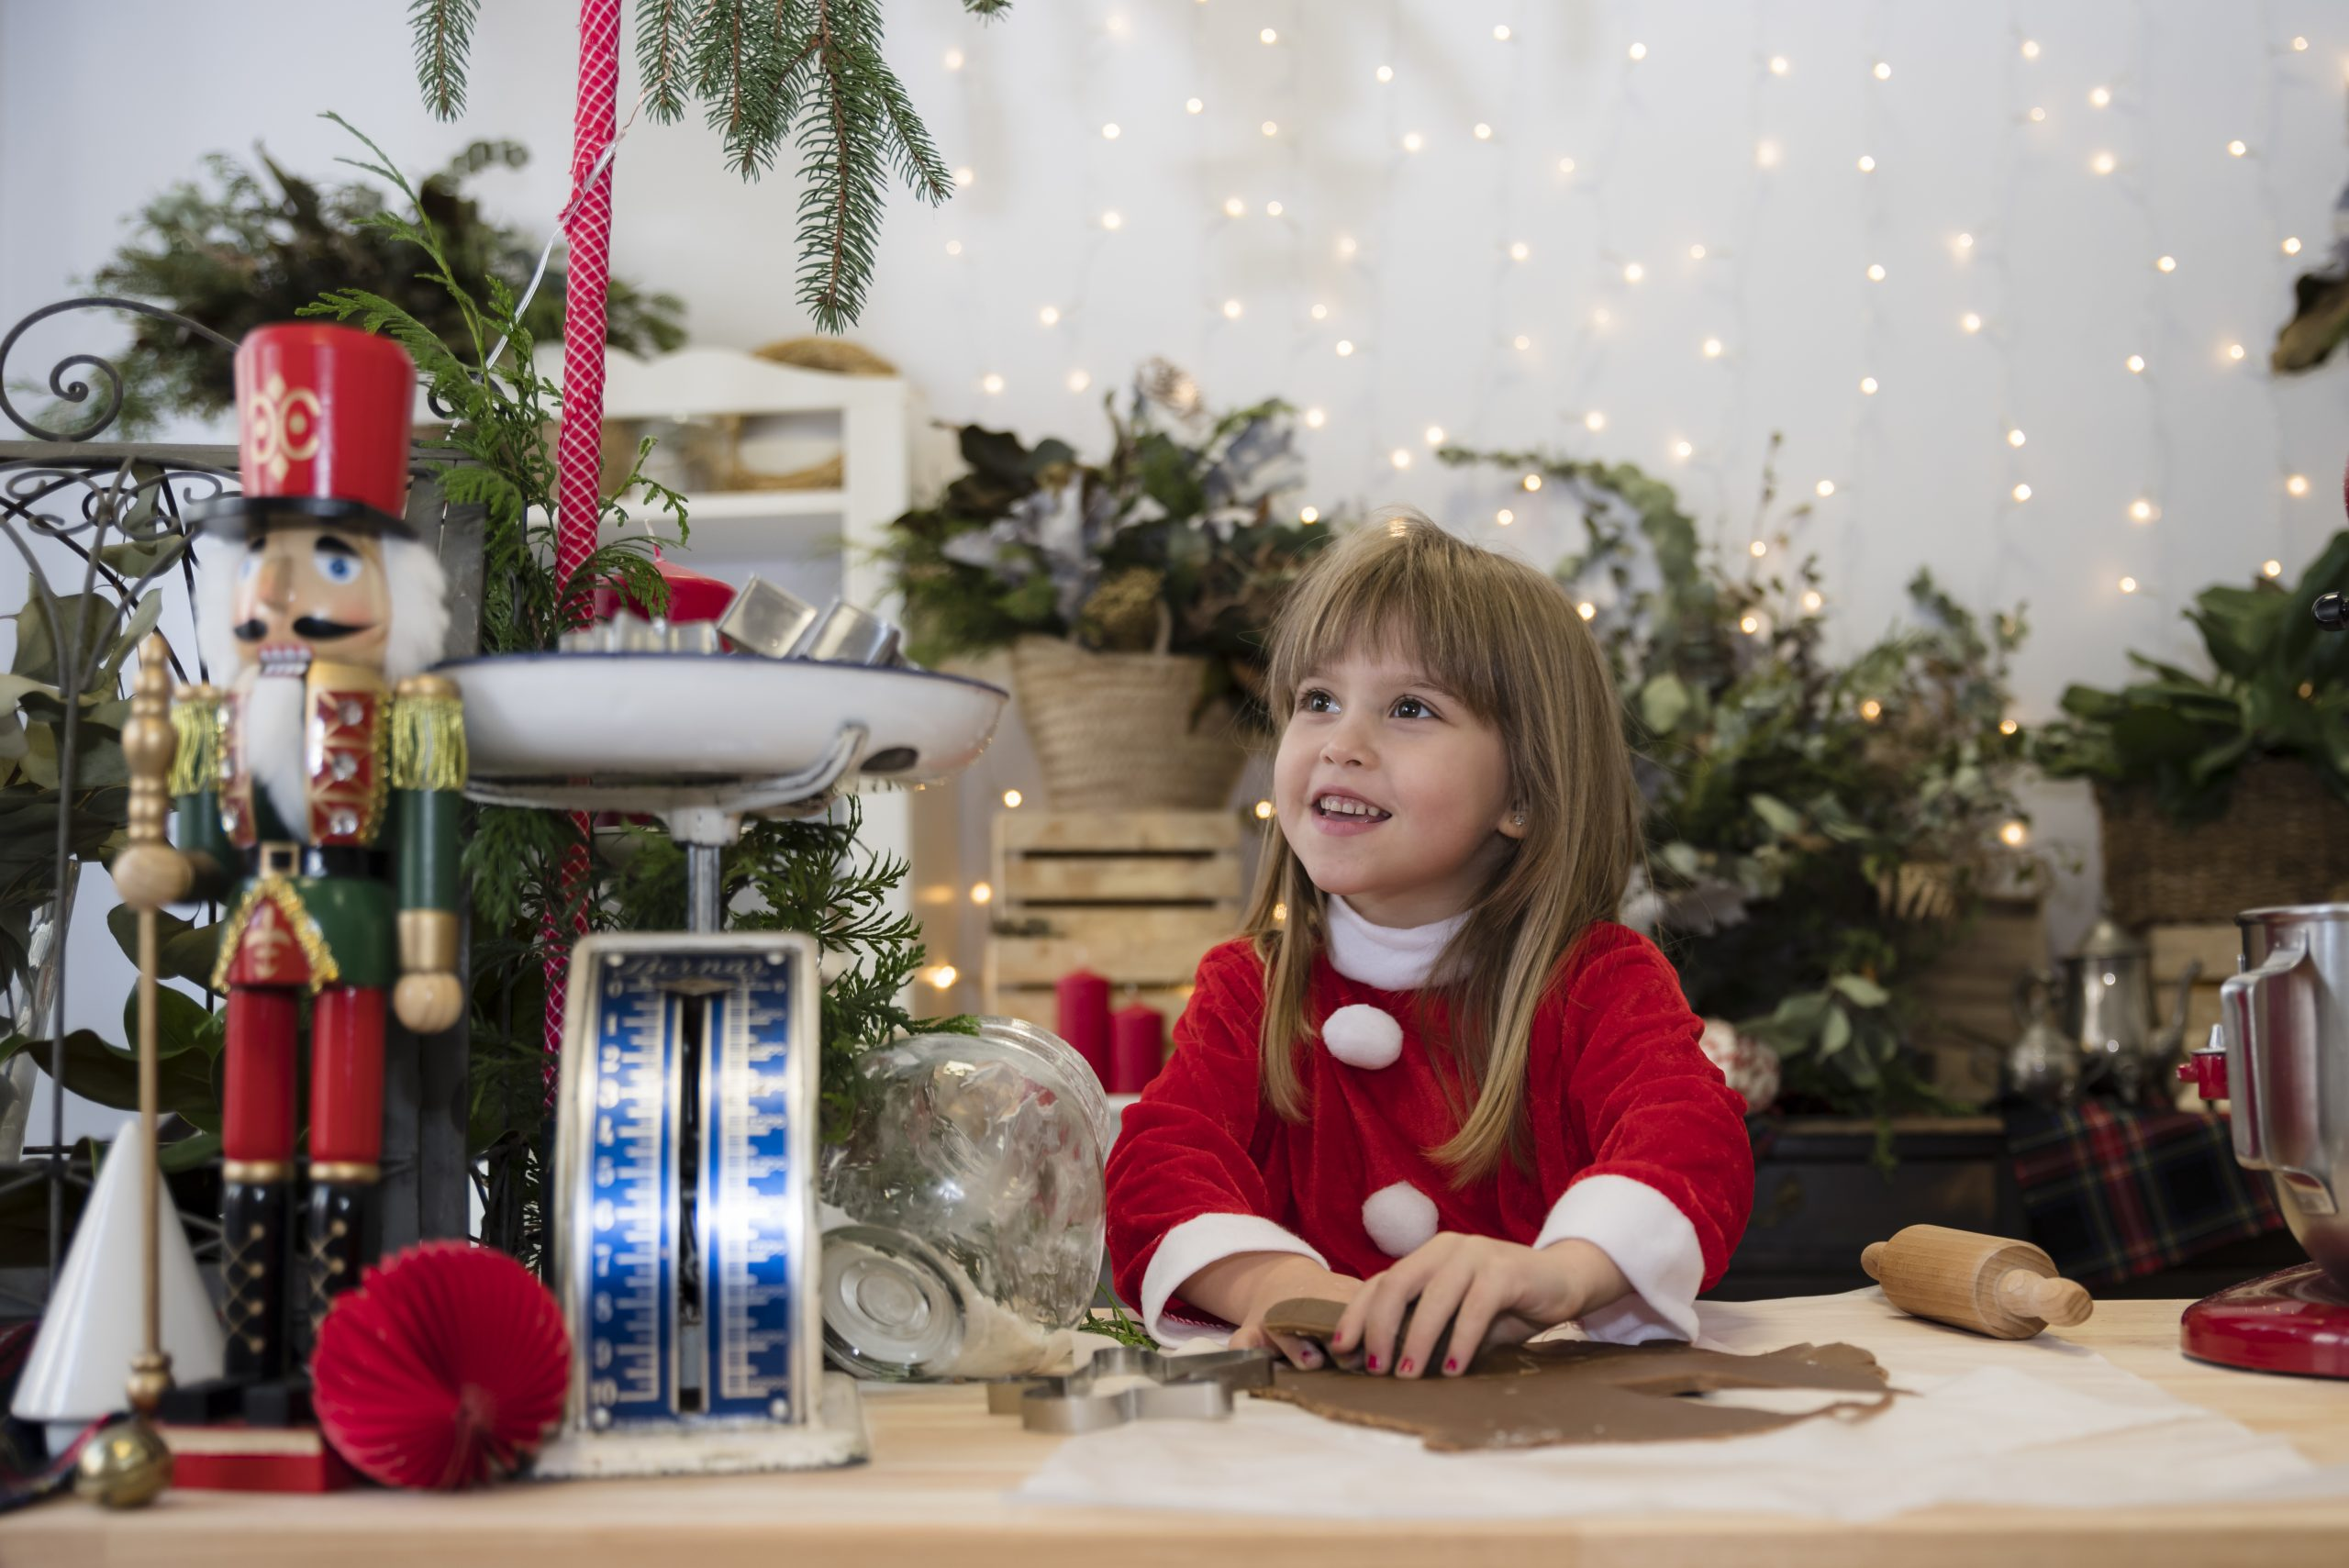 Sesión fotográfica Navidad en familia por Diana Fajardo